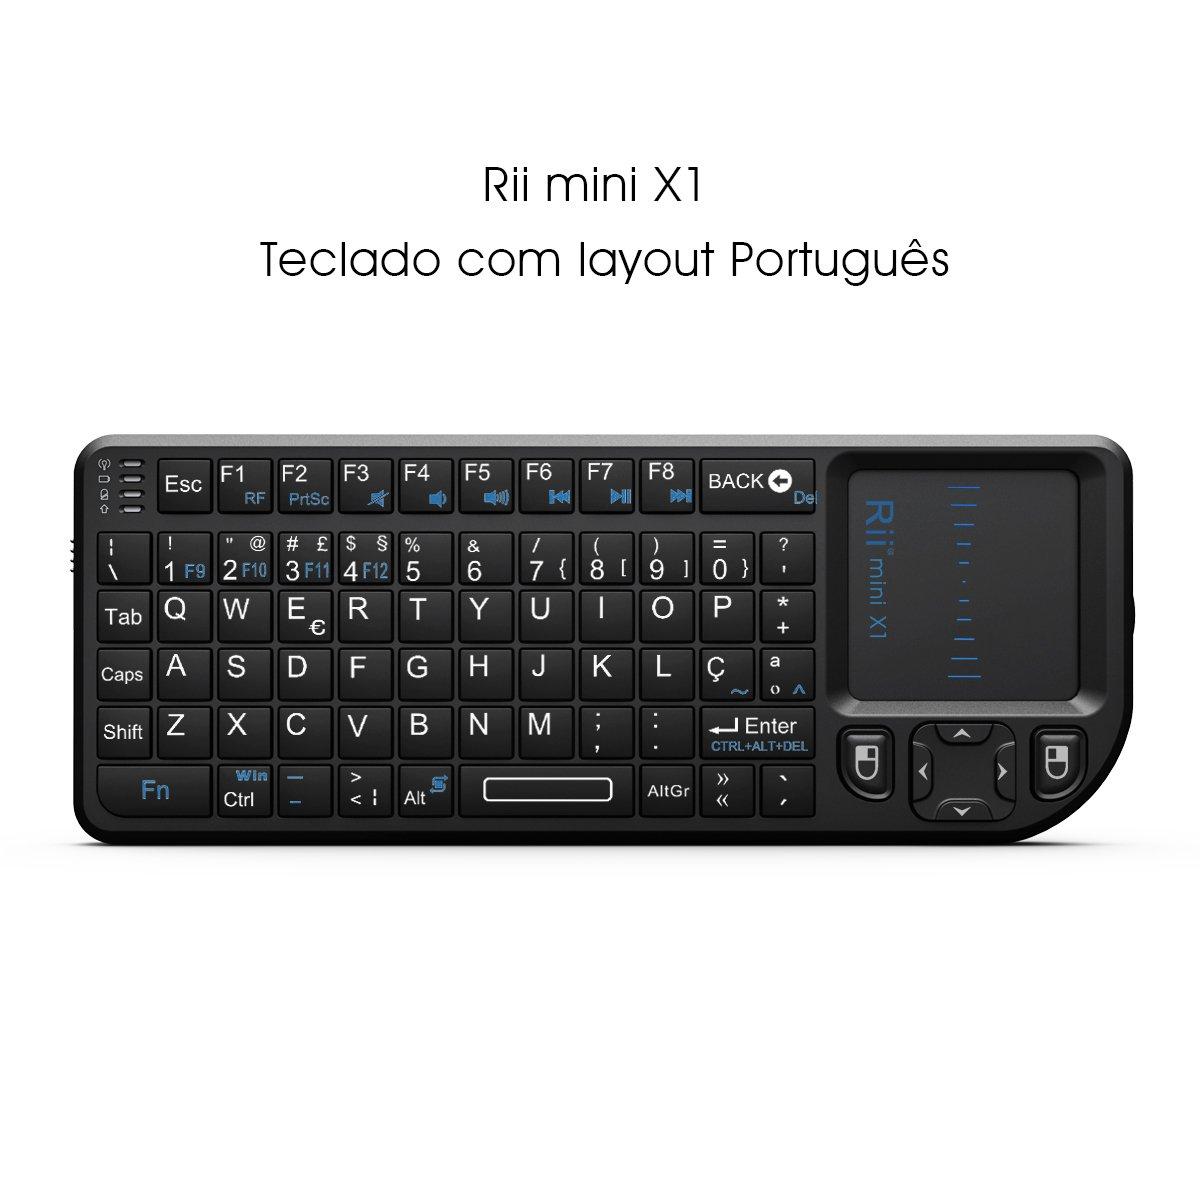 Teclado Wireless Rii Mini X com touchpad compatível com SmartTV Android Mini